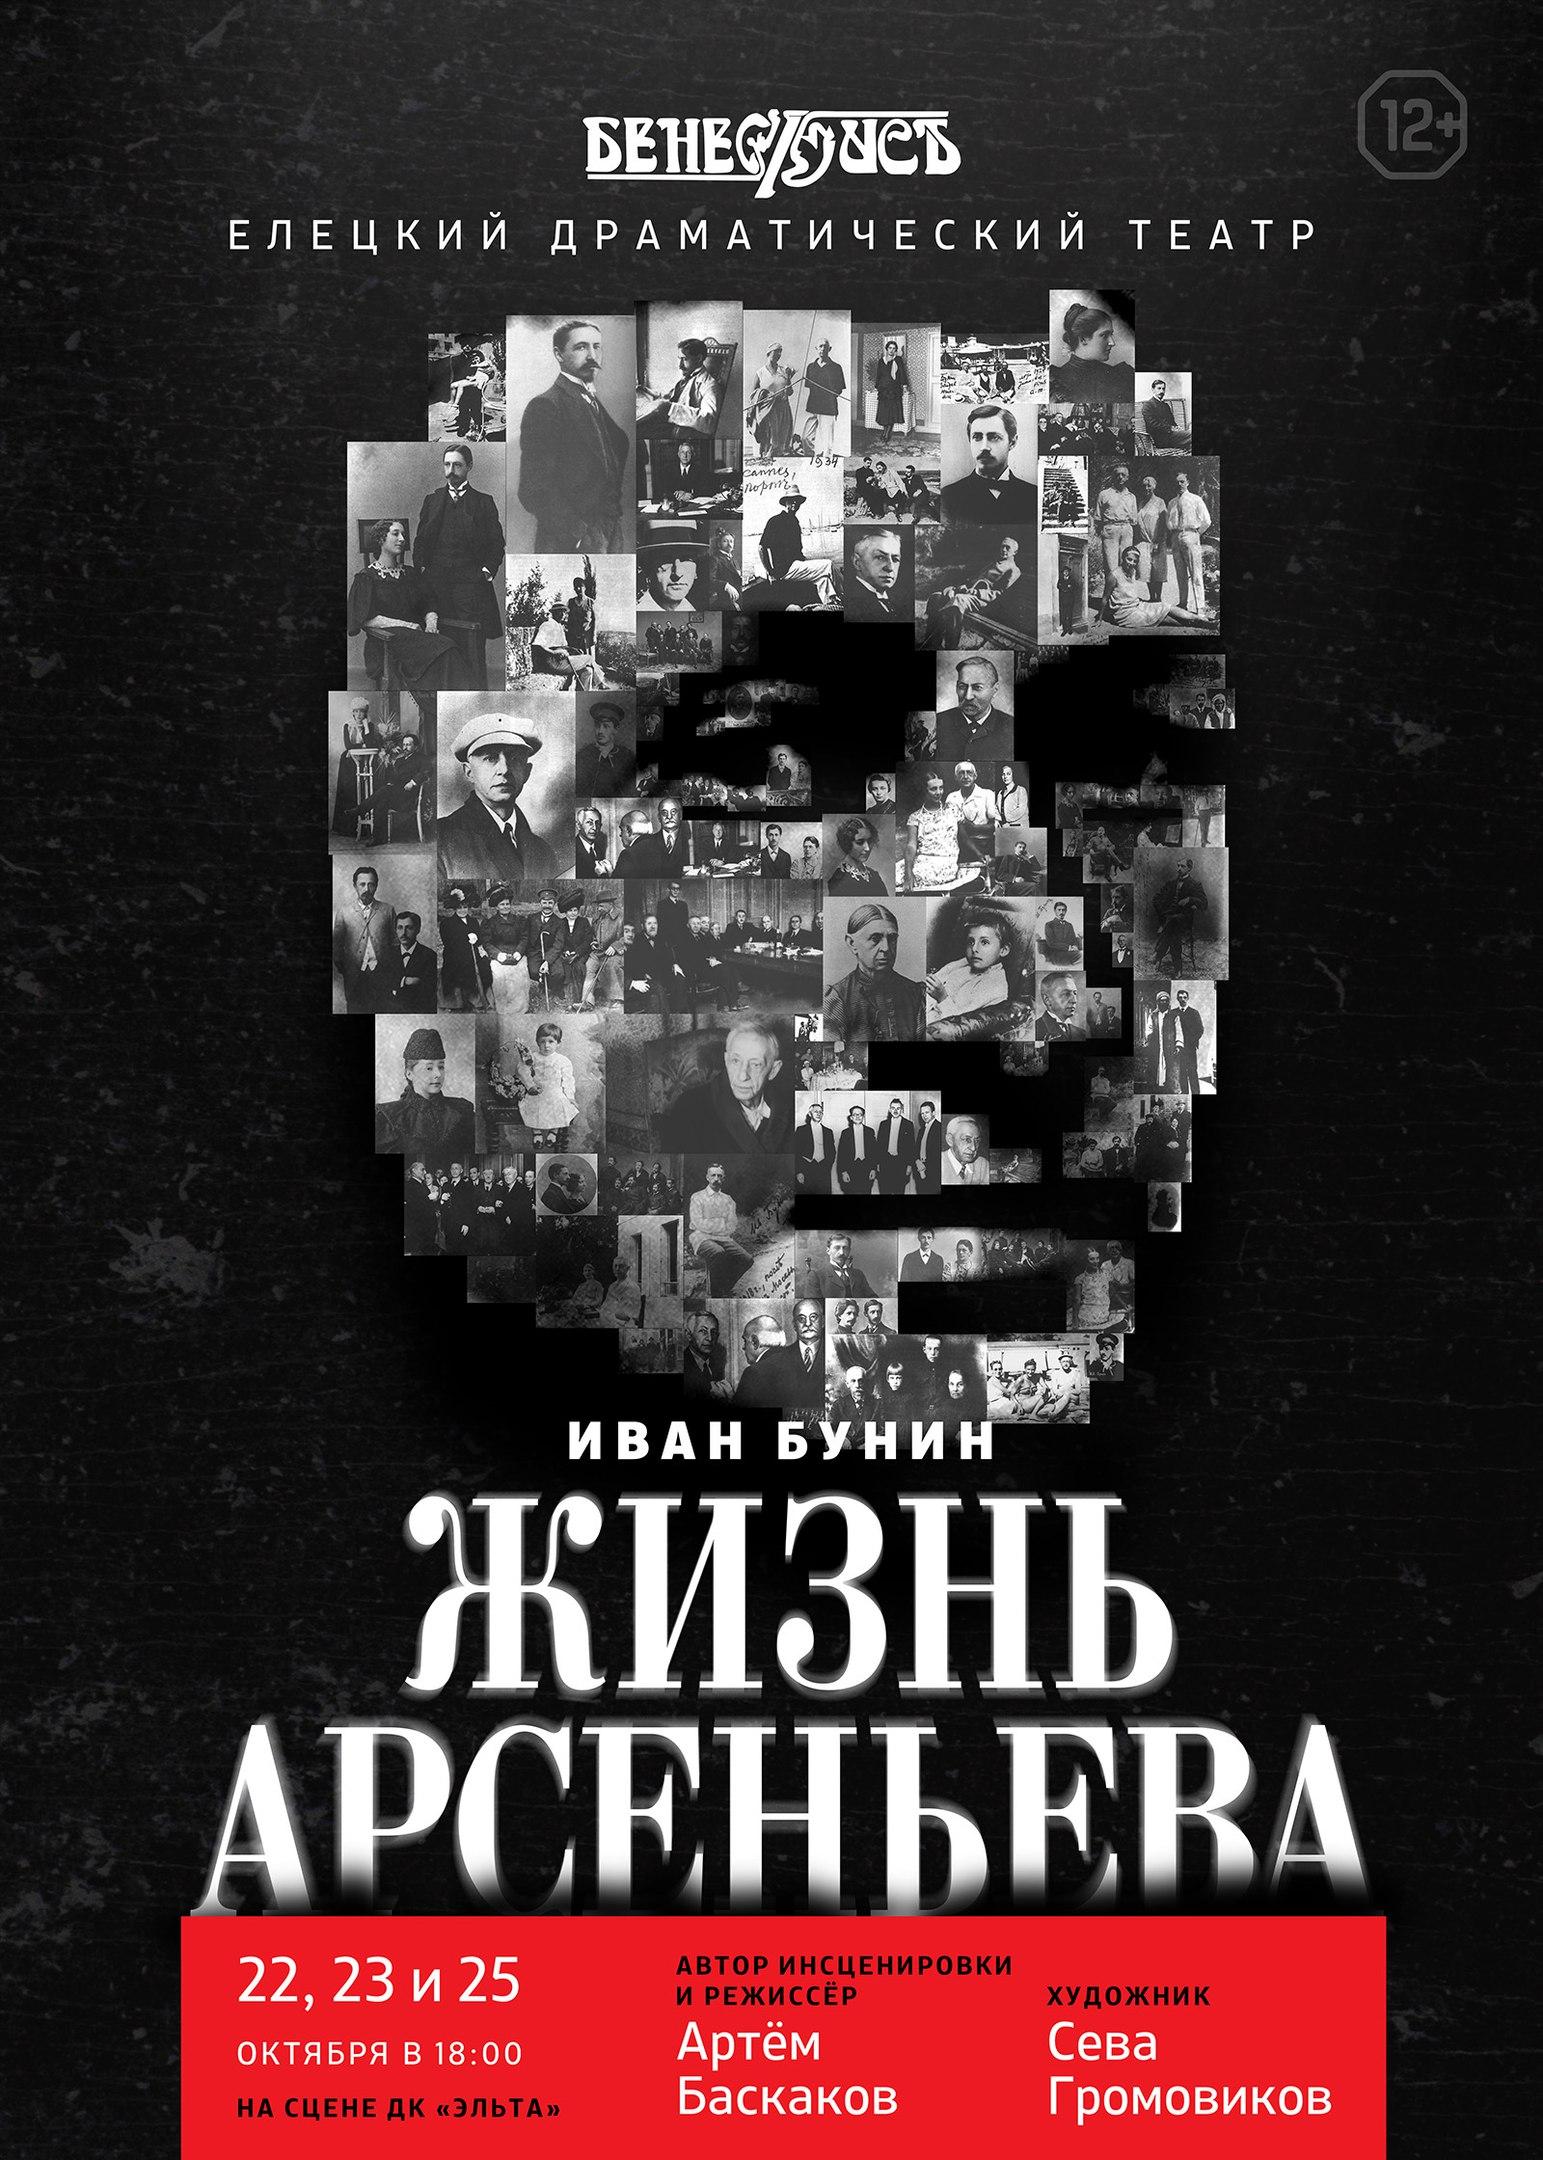 Автор афиши Тимур Корхов